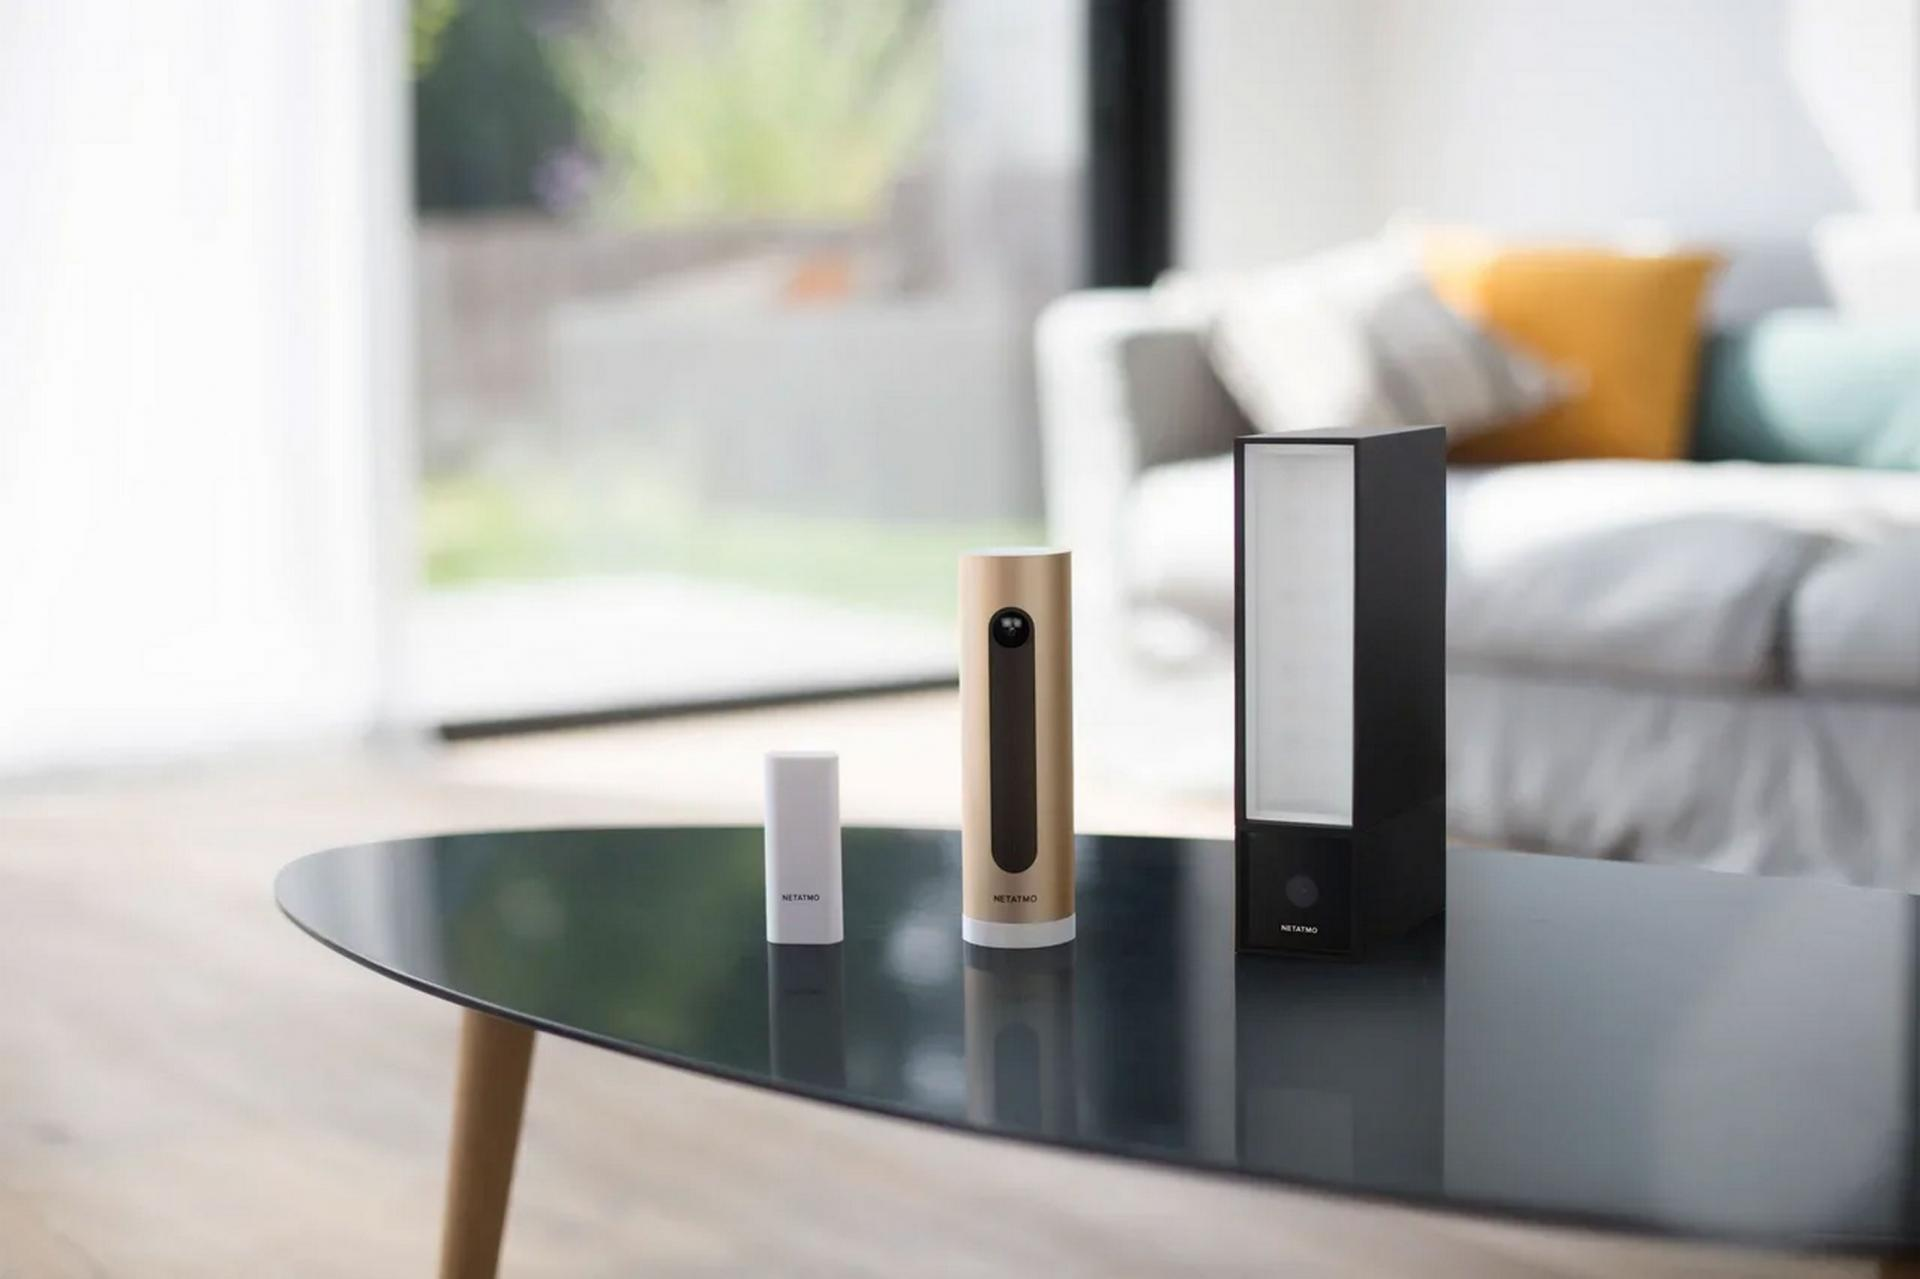 Группа Legrand представила обновлённую линейку IoT-устройств для дома под брендом Netatmo